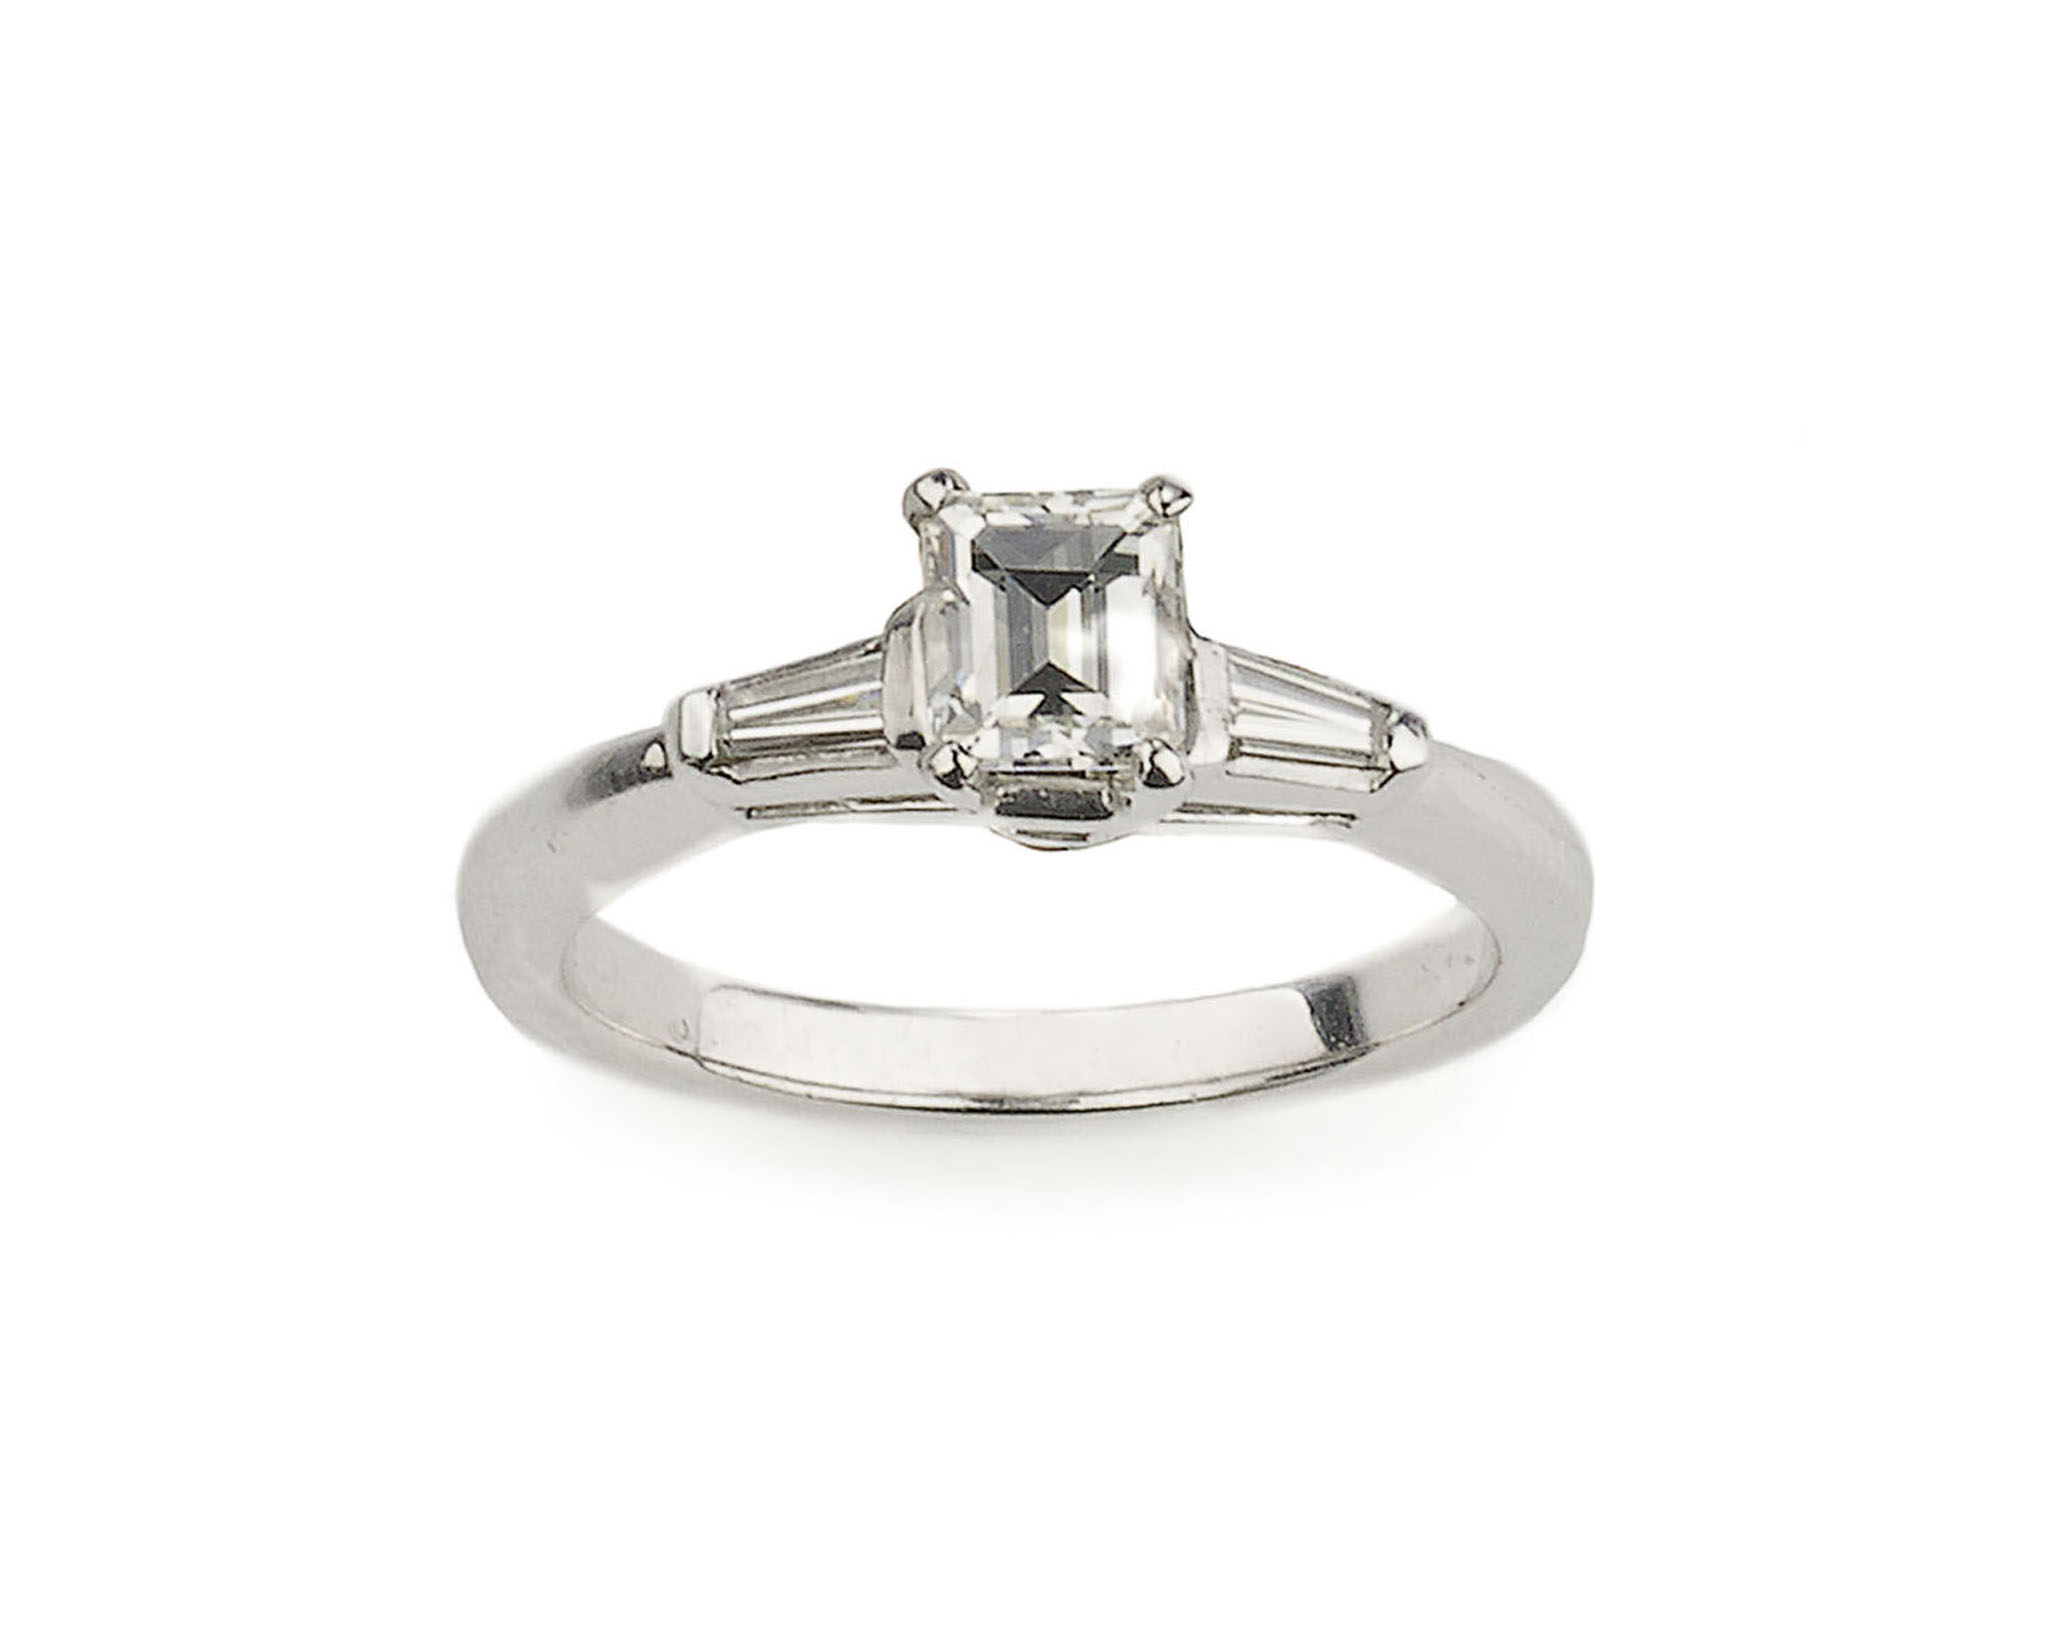 Emerald Cut Diamond Baguette Shoulders Ring